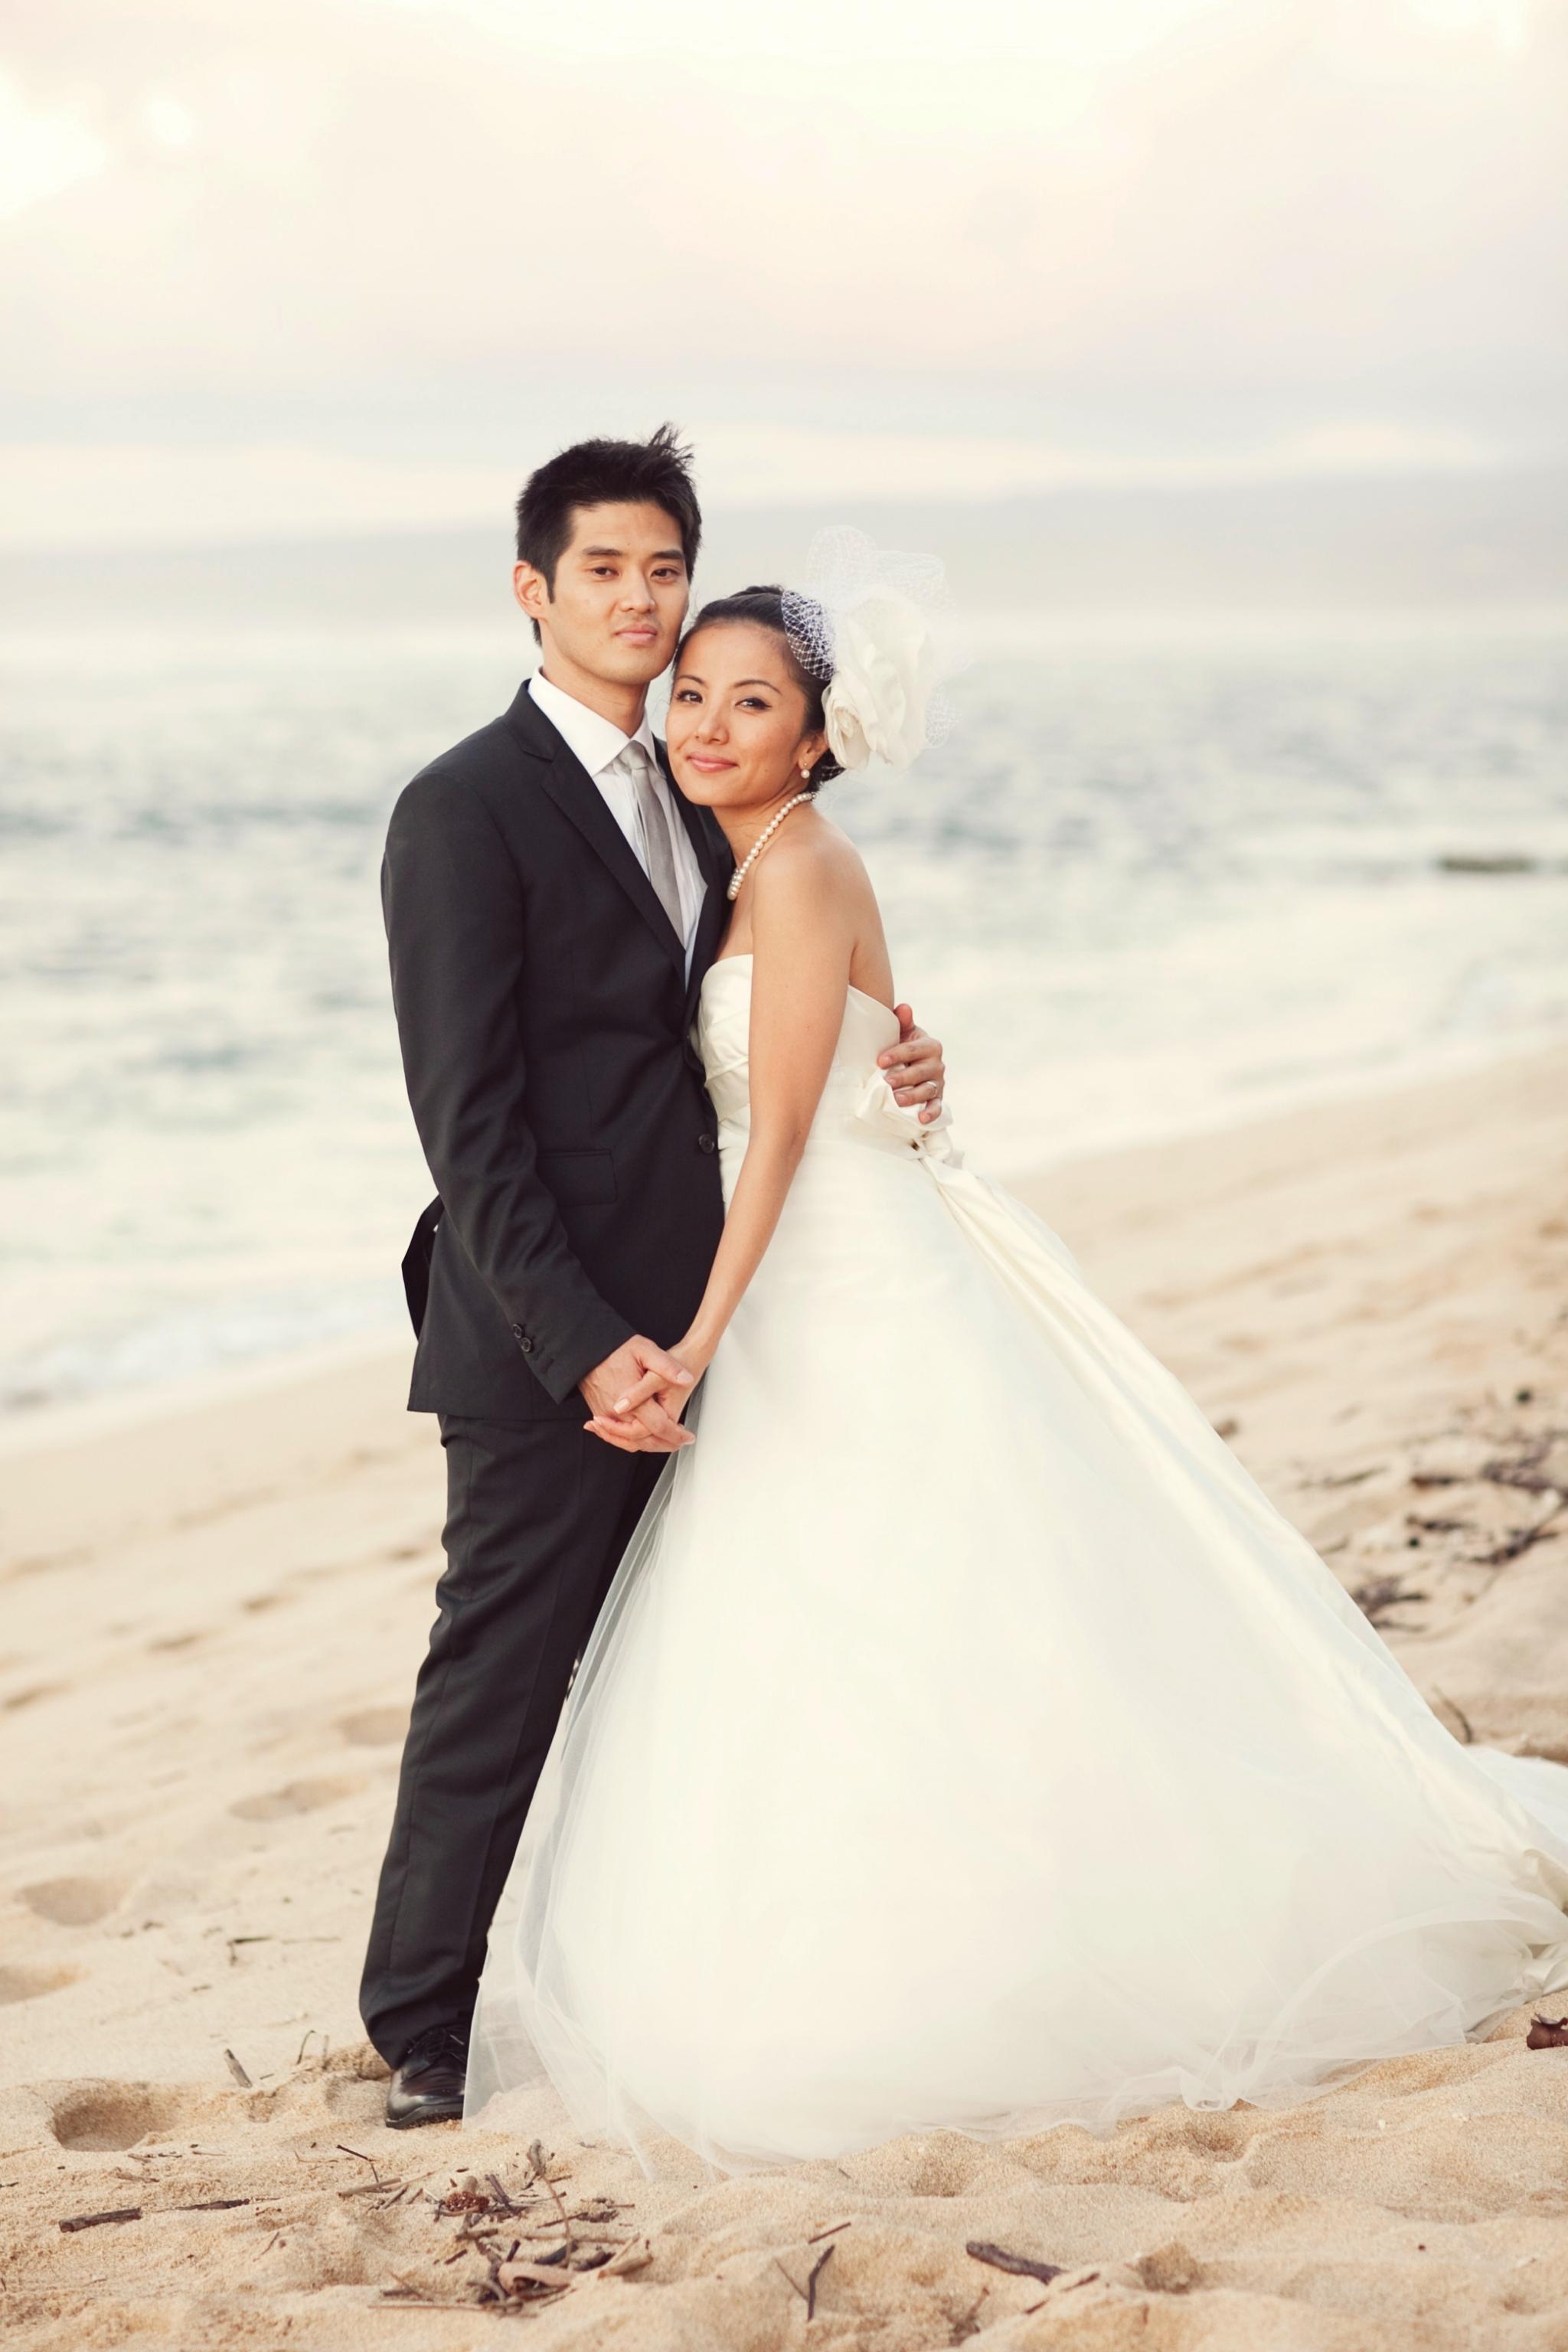 A Destination Wedding in Hawaii | Honolulu Wedding